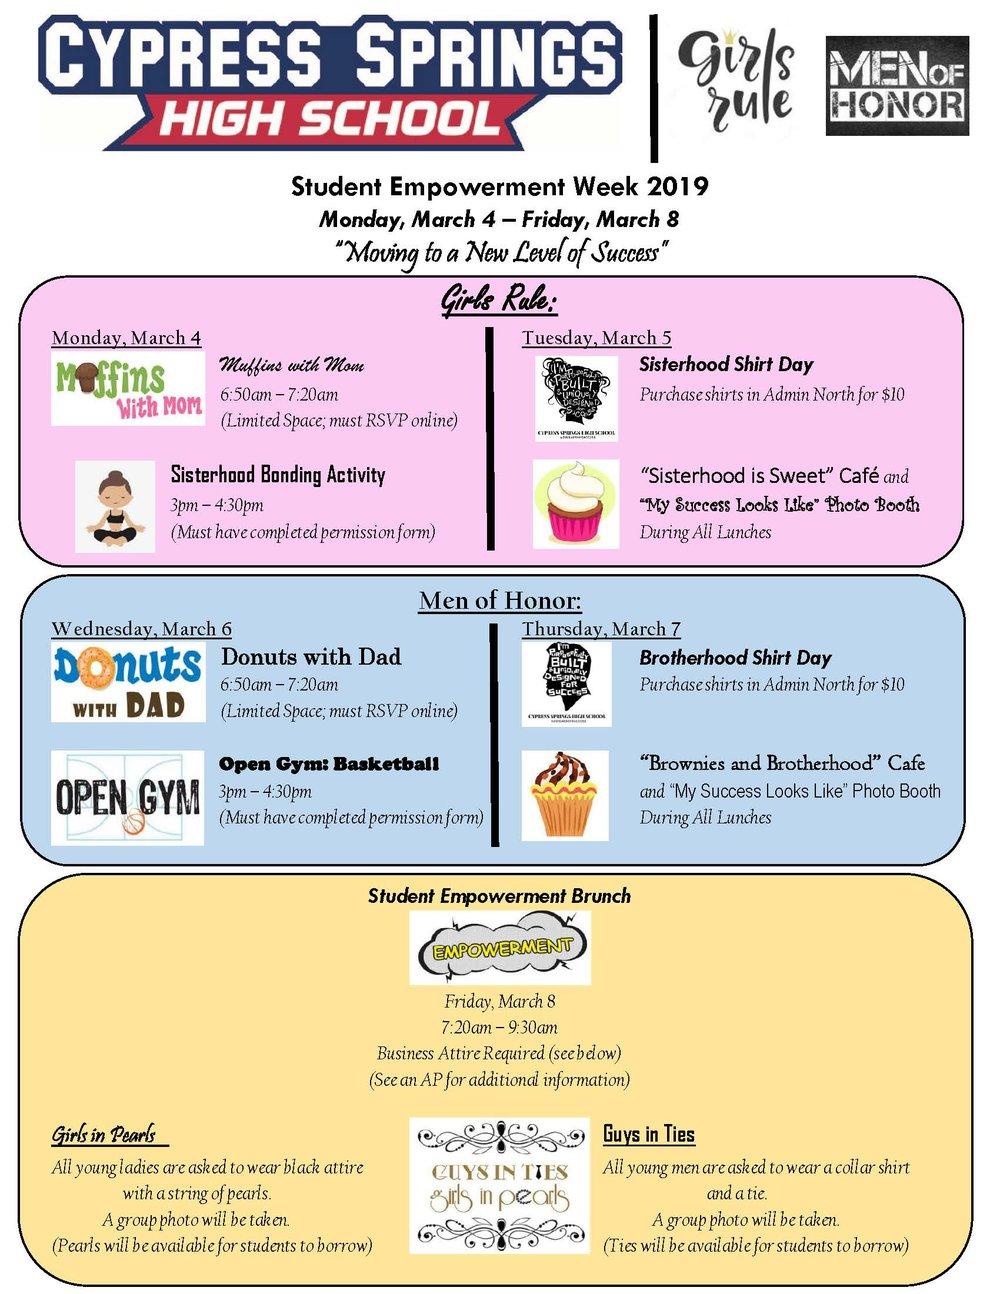 Student Empowerment Week Flyer 2019 (1).jpg